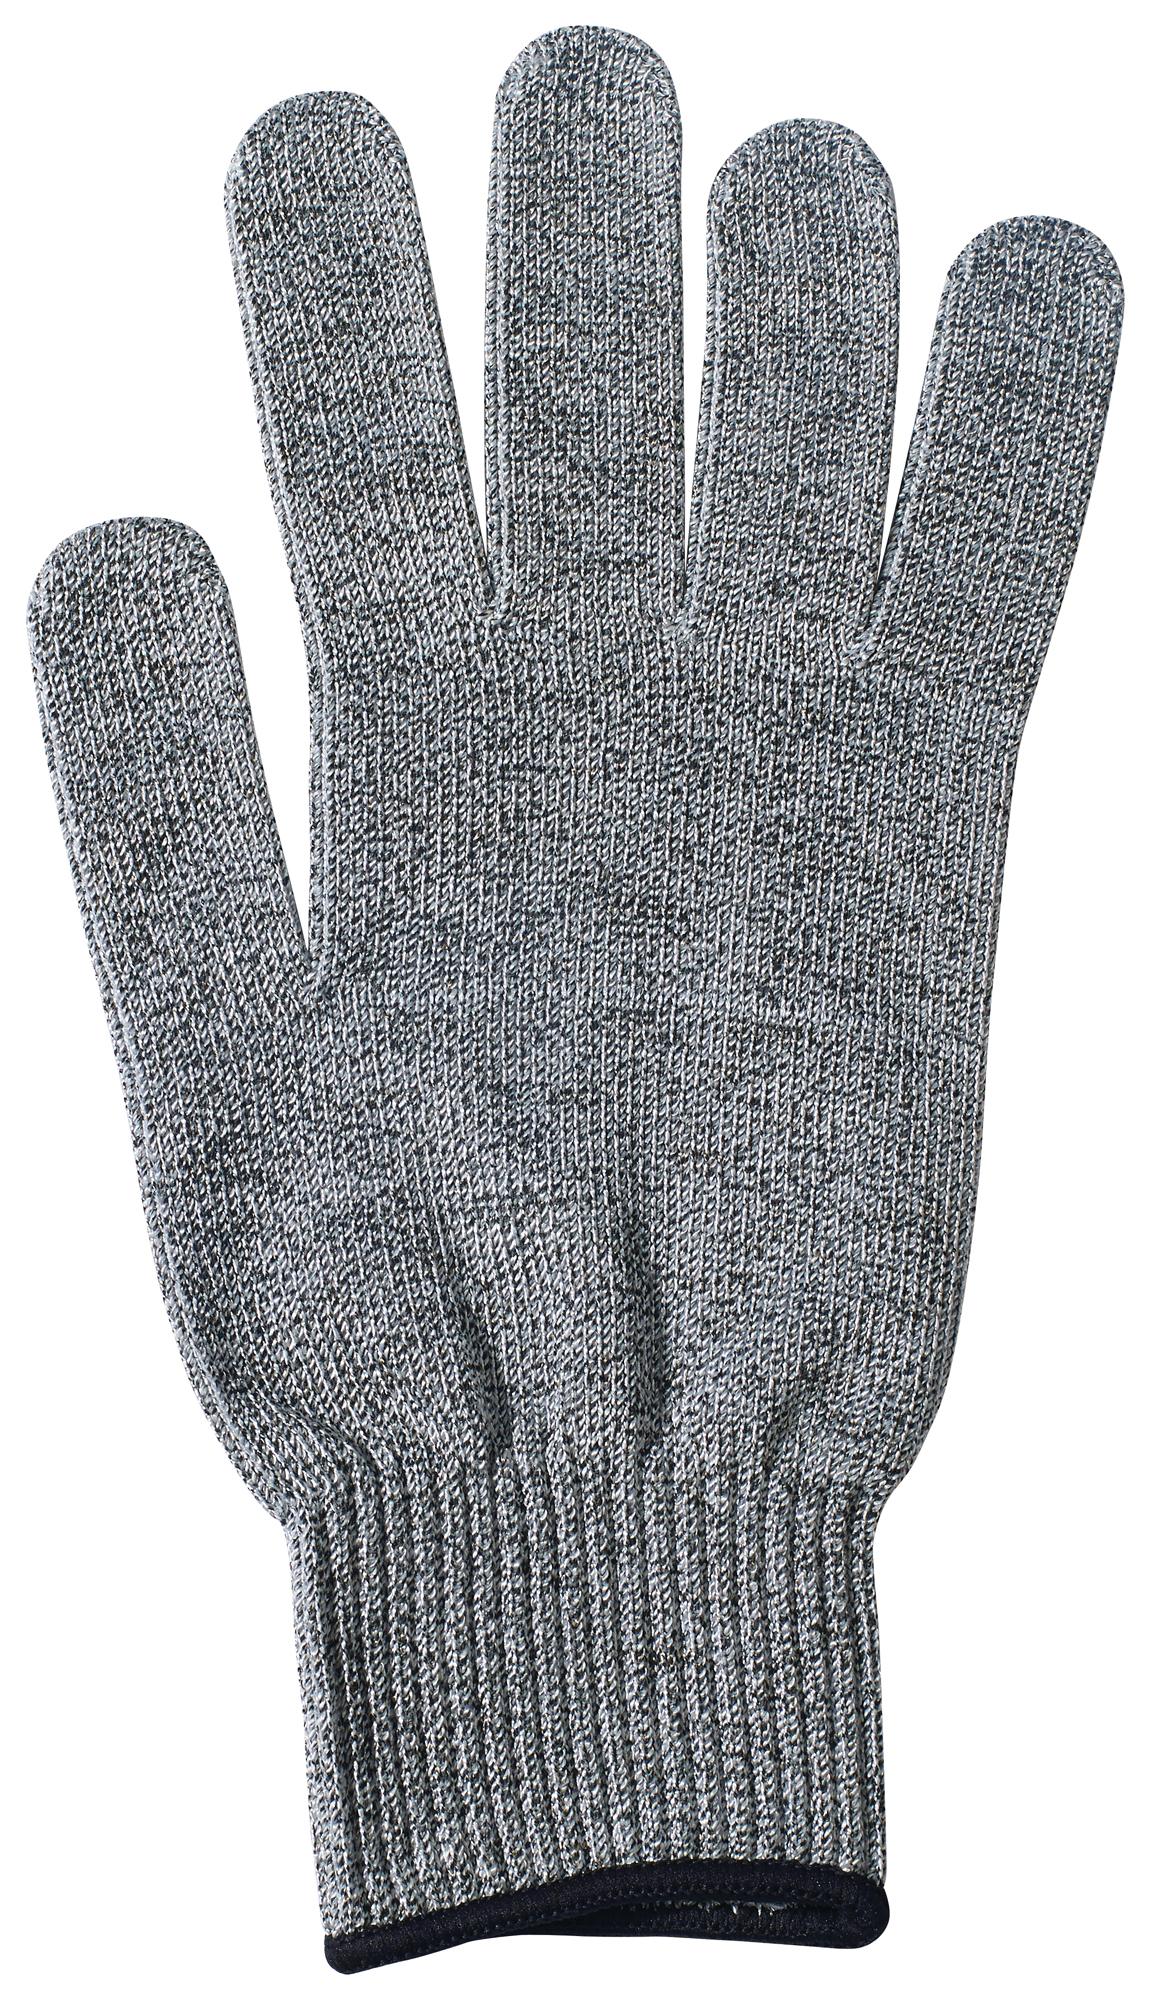 Winco GCRA-XL resistant glove